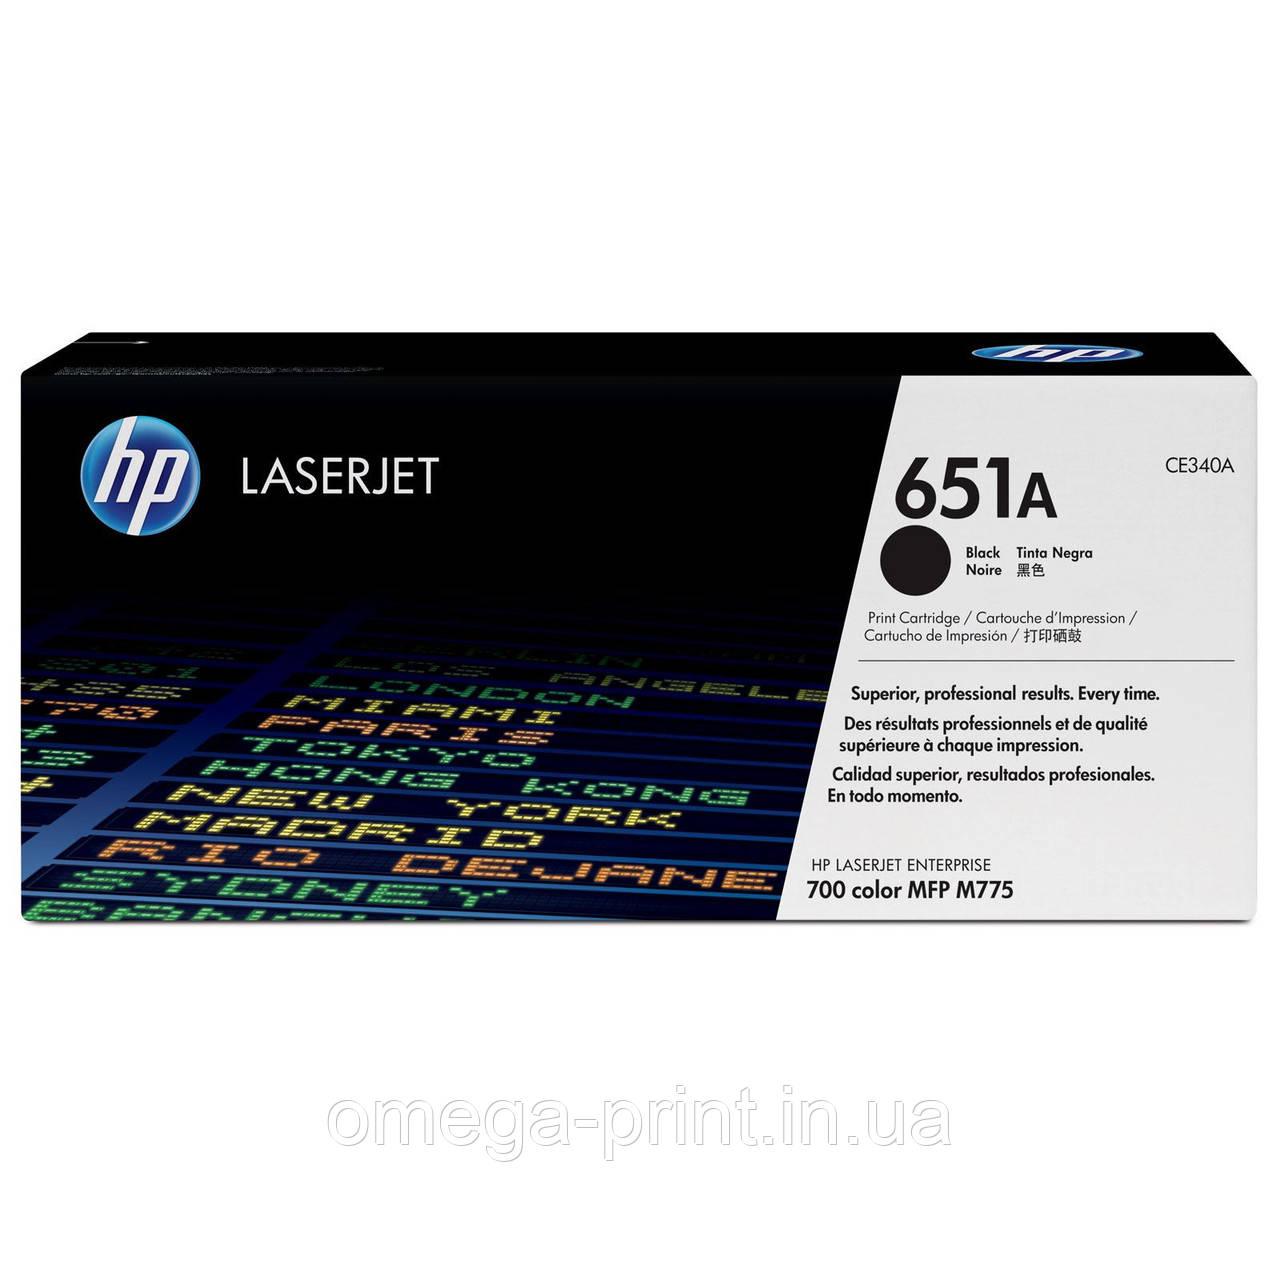 Картридж HP CLJ M775, (CE340A/651A), Black